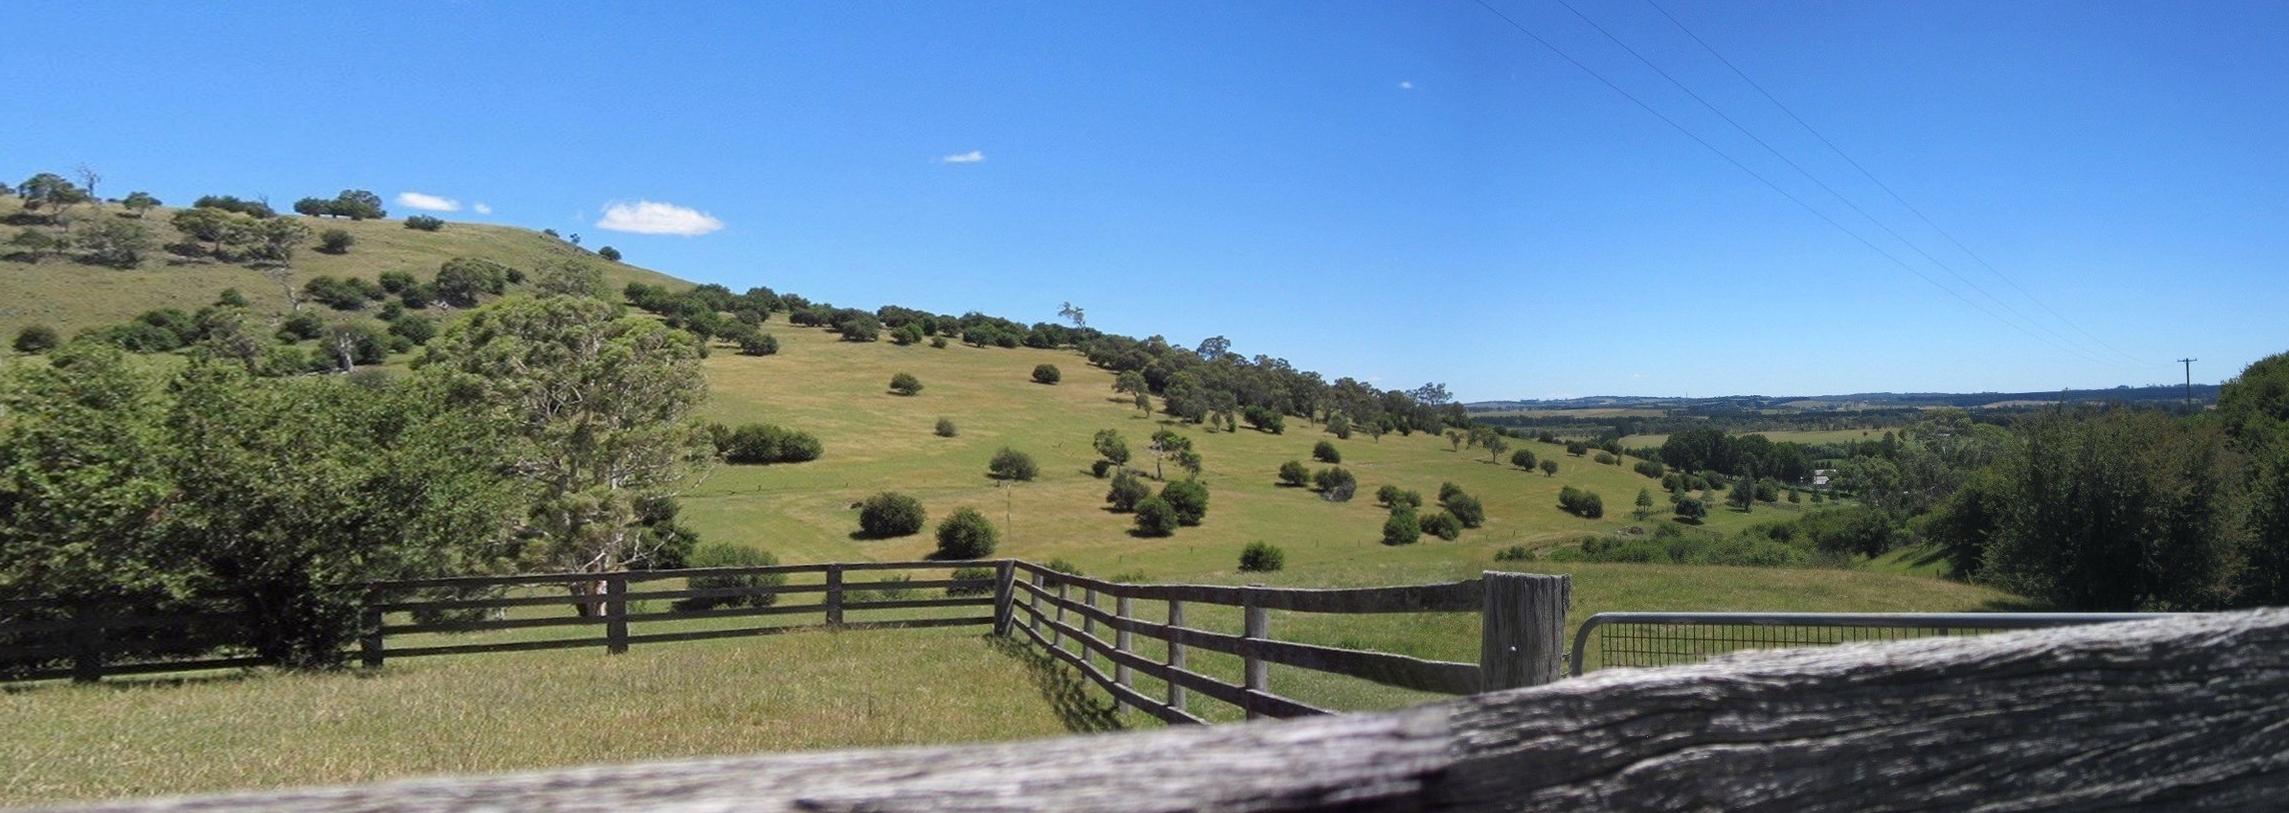 Berrima panorama 2.jpg